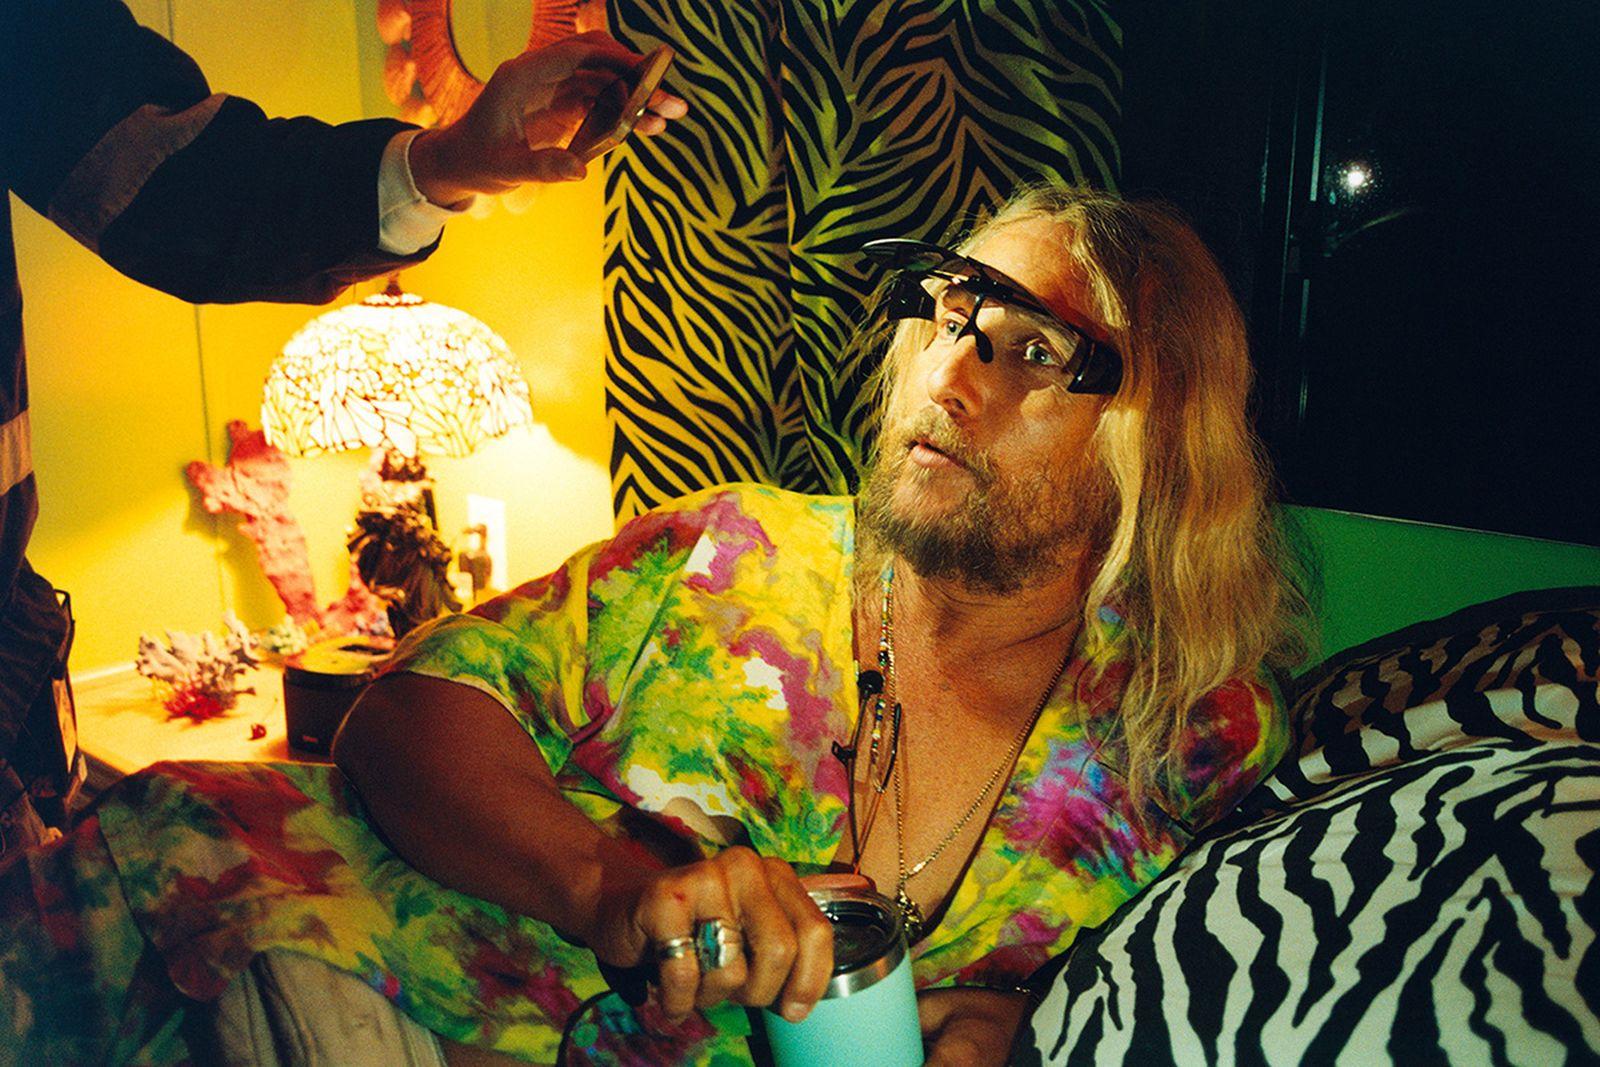 Frank Tyrone Lebon inside the bum interview The Beach Bum harmony korine